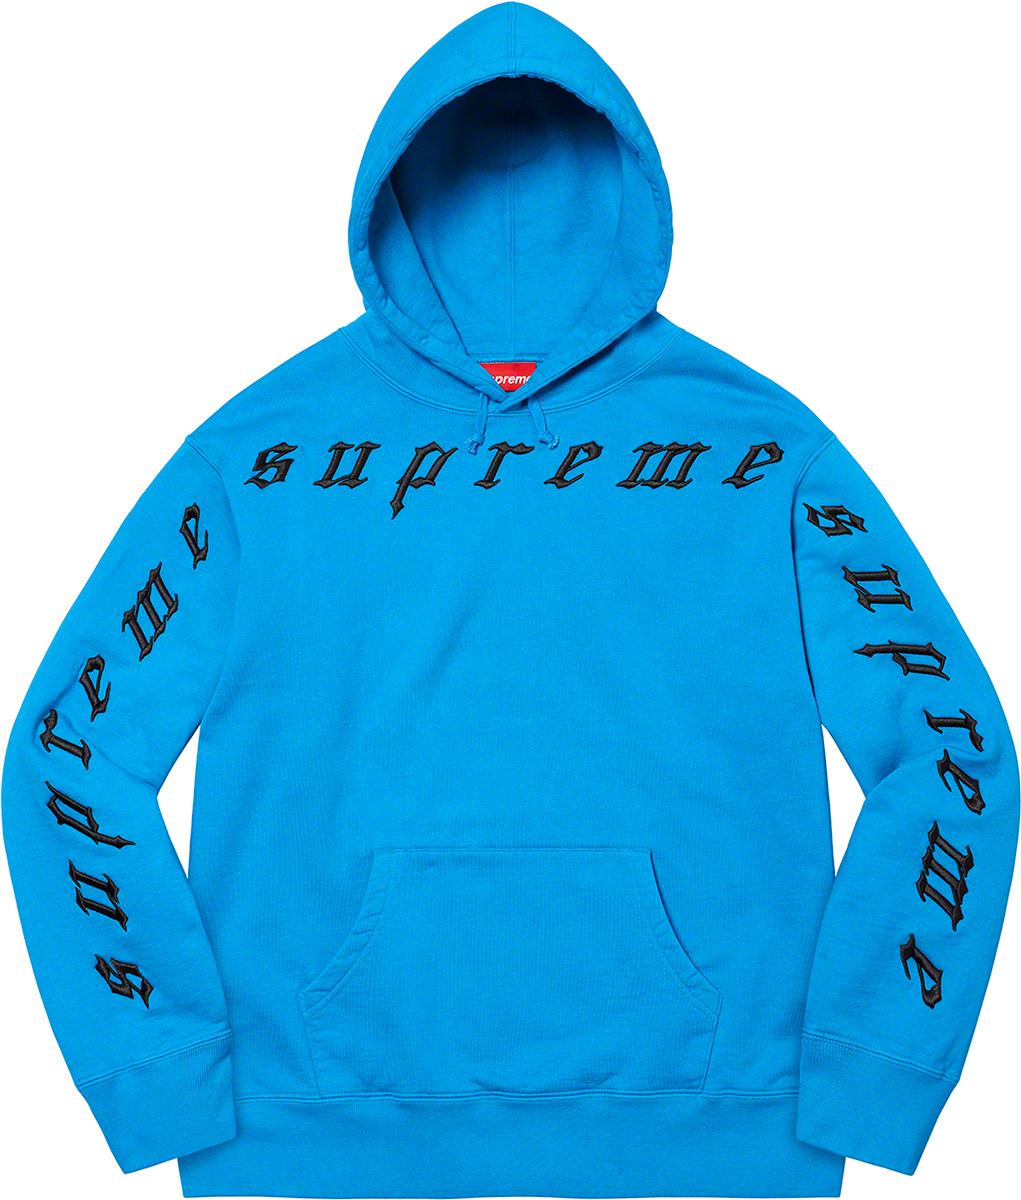 supreme-21aw-21fw-raised-embroidery-hooded-sweatshirt